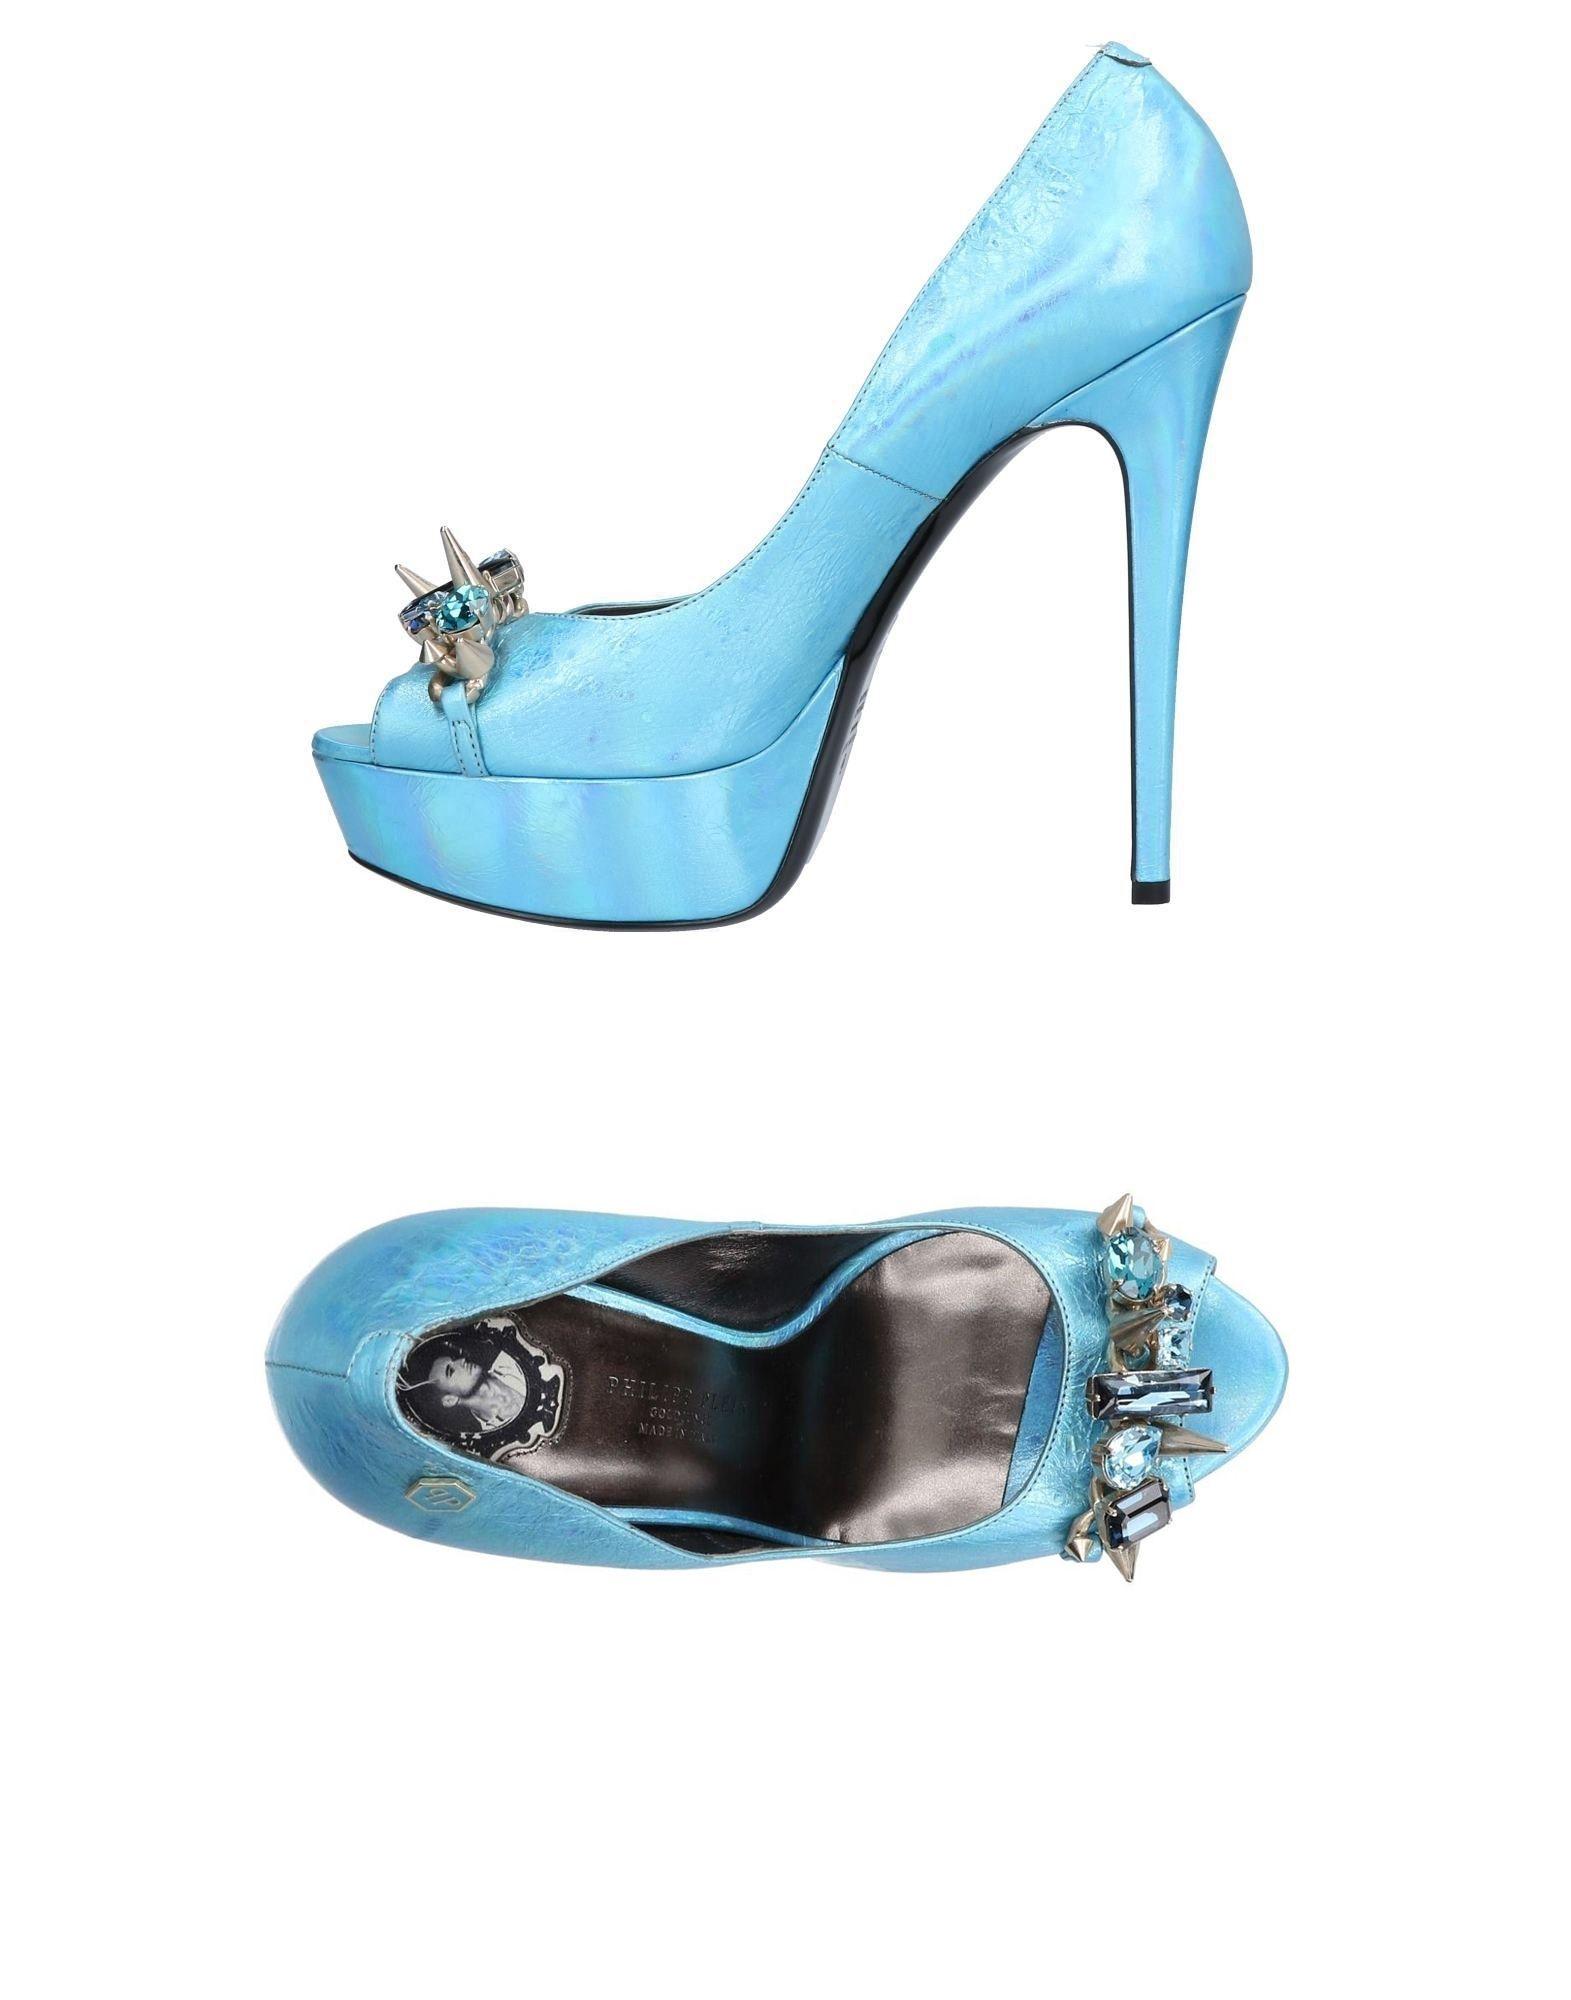 Philipp Plein Pumps Damen Schuhe  11454369EAGünstige gut aussehende Schuhe Damen a1bcce